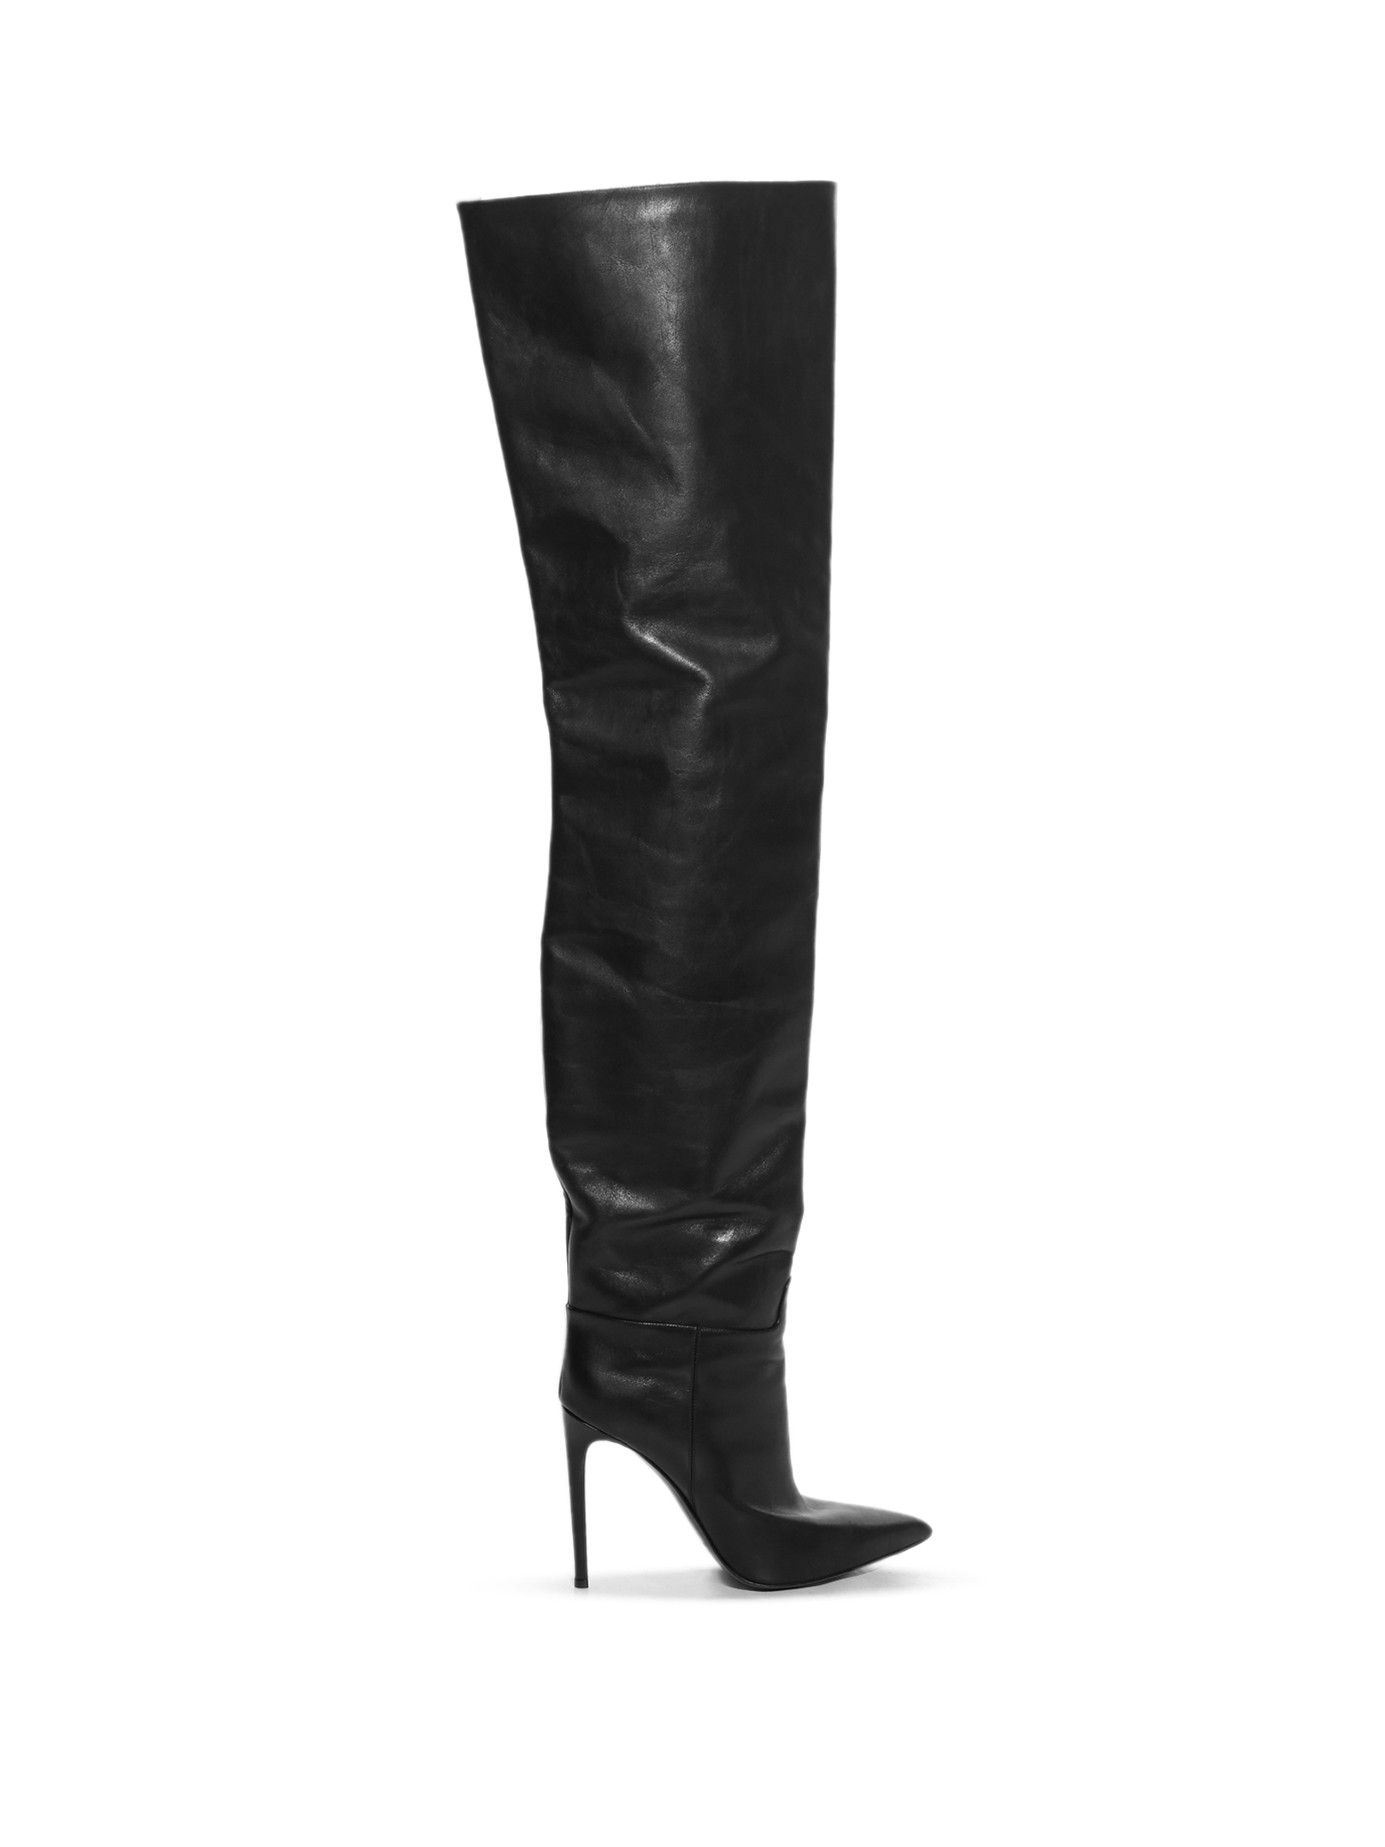 authentic quality wholesale sale retailer Balenciaga XXL thigh-boots - Black | Balenciaga boots, Boots ...